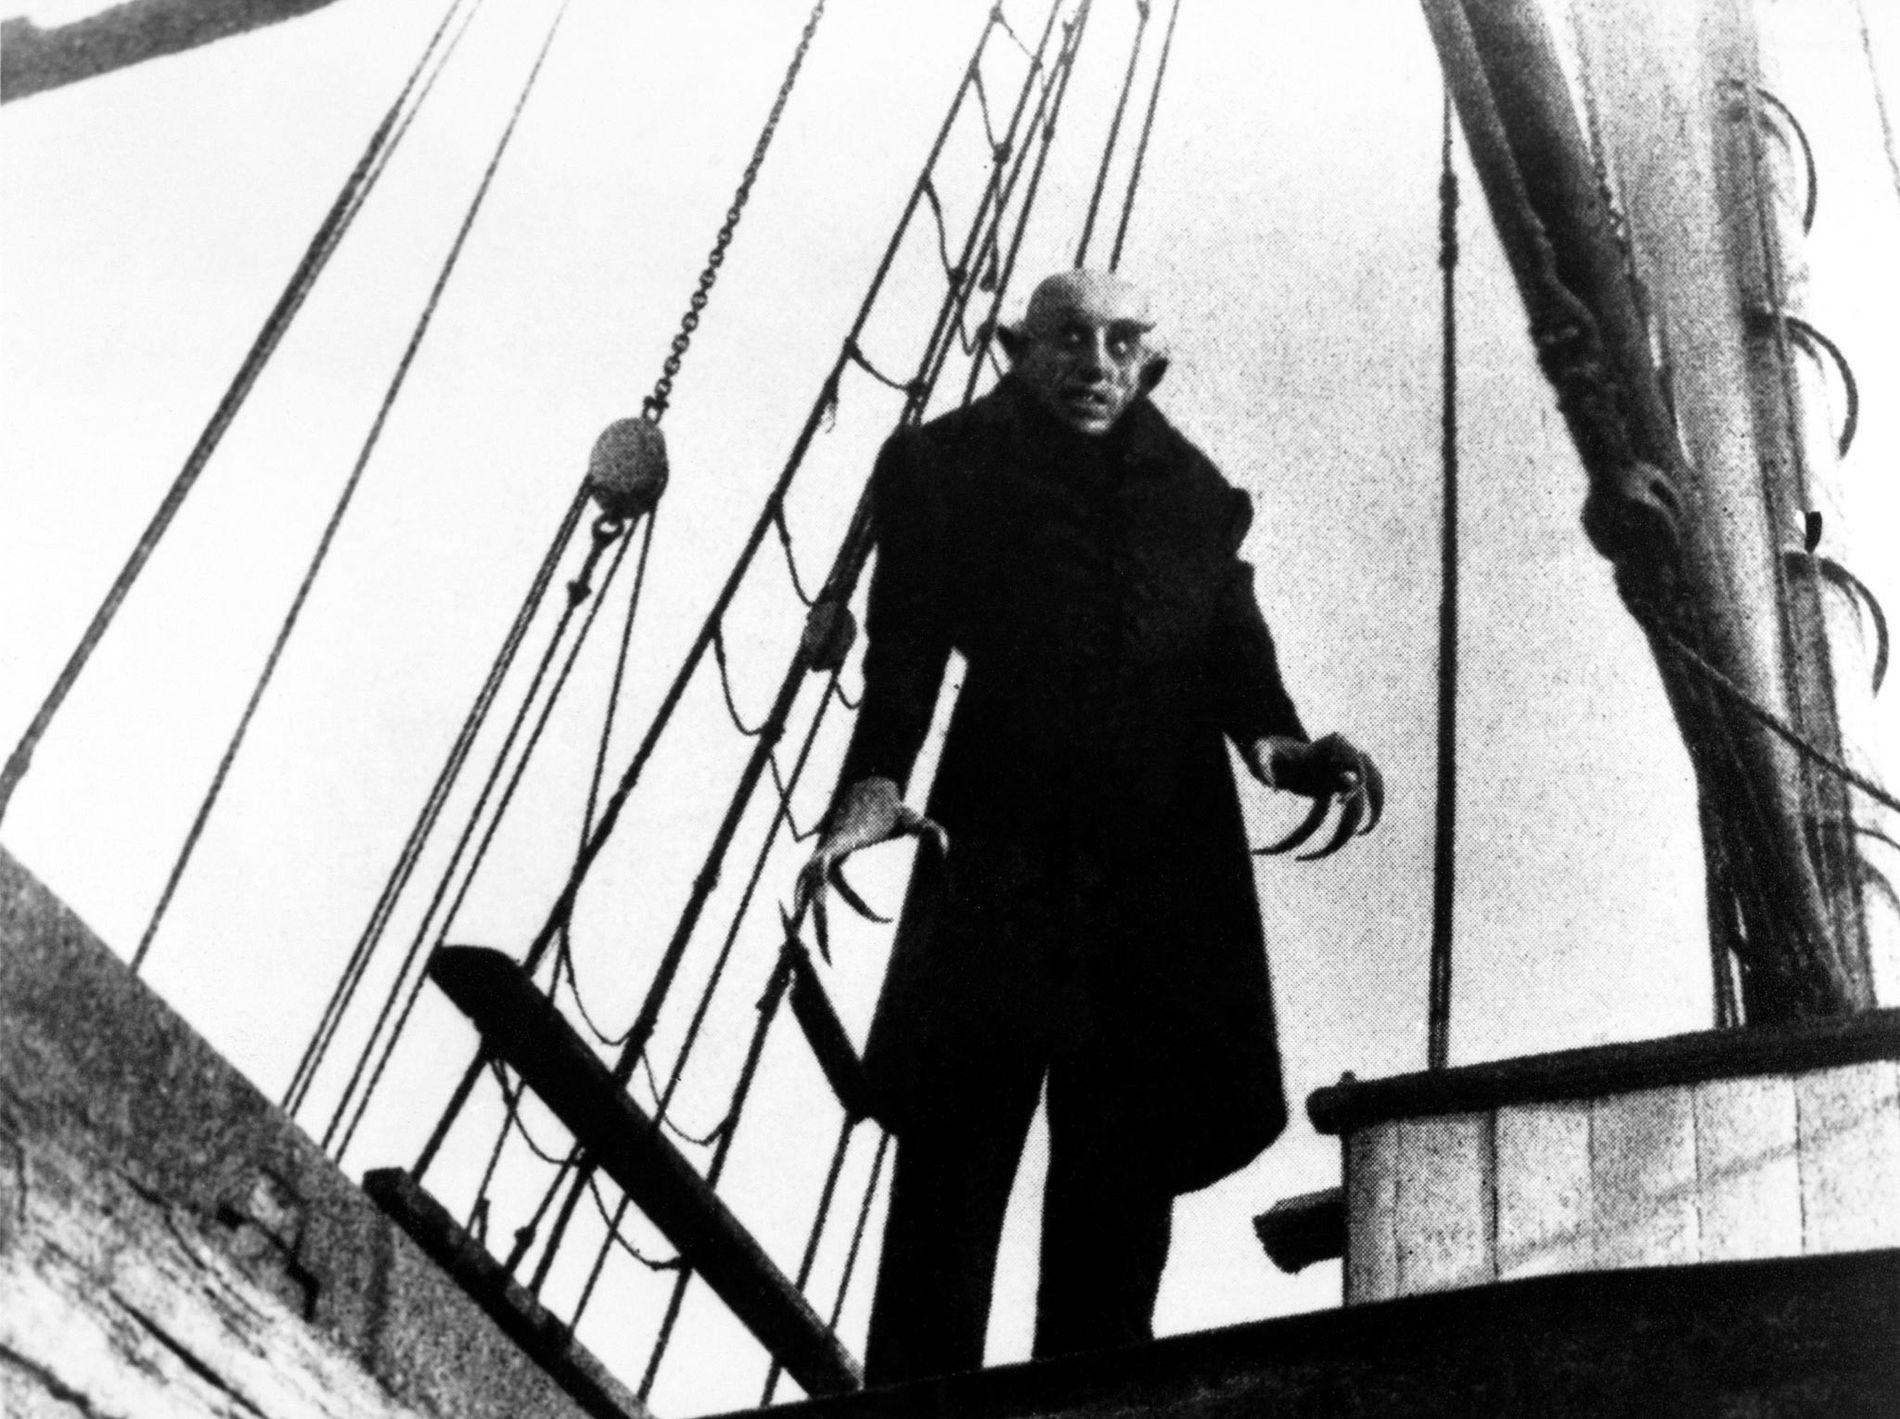 Le film muet de 1922 Nosferatu est une adaptation non autorisée du roman Dracula de Bram ...